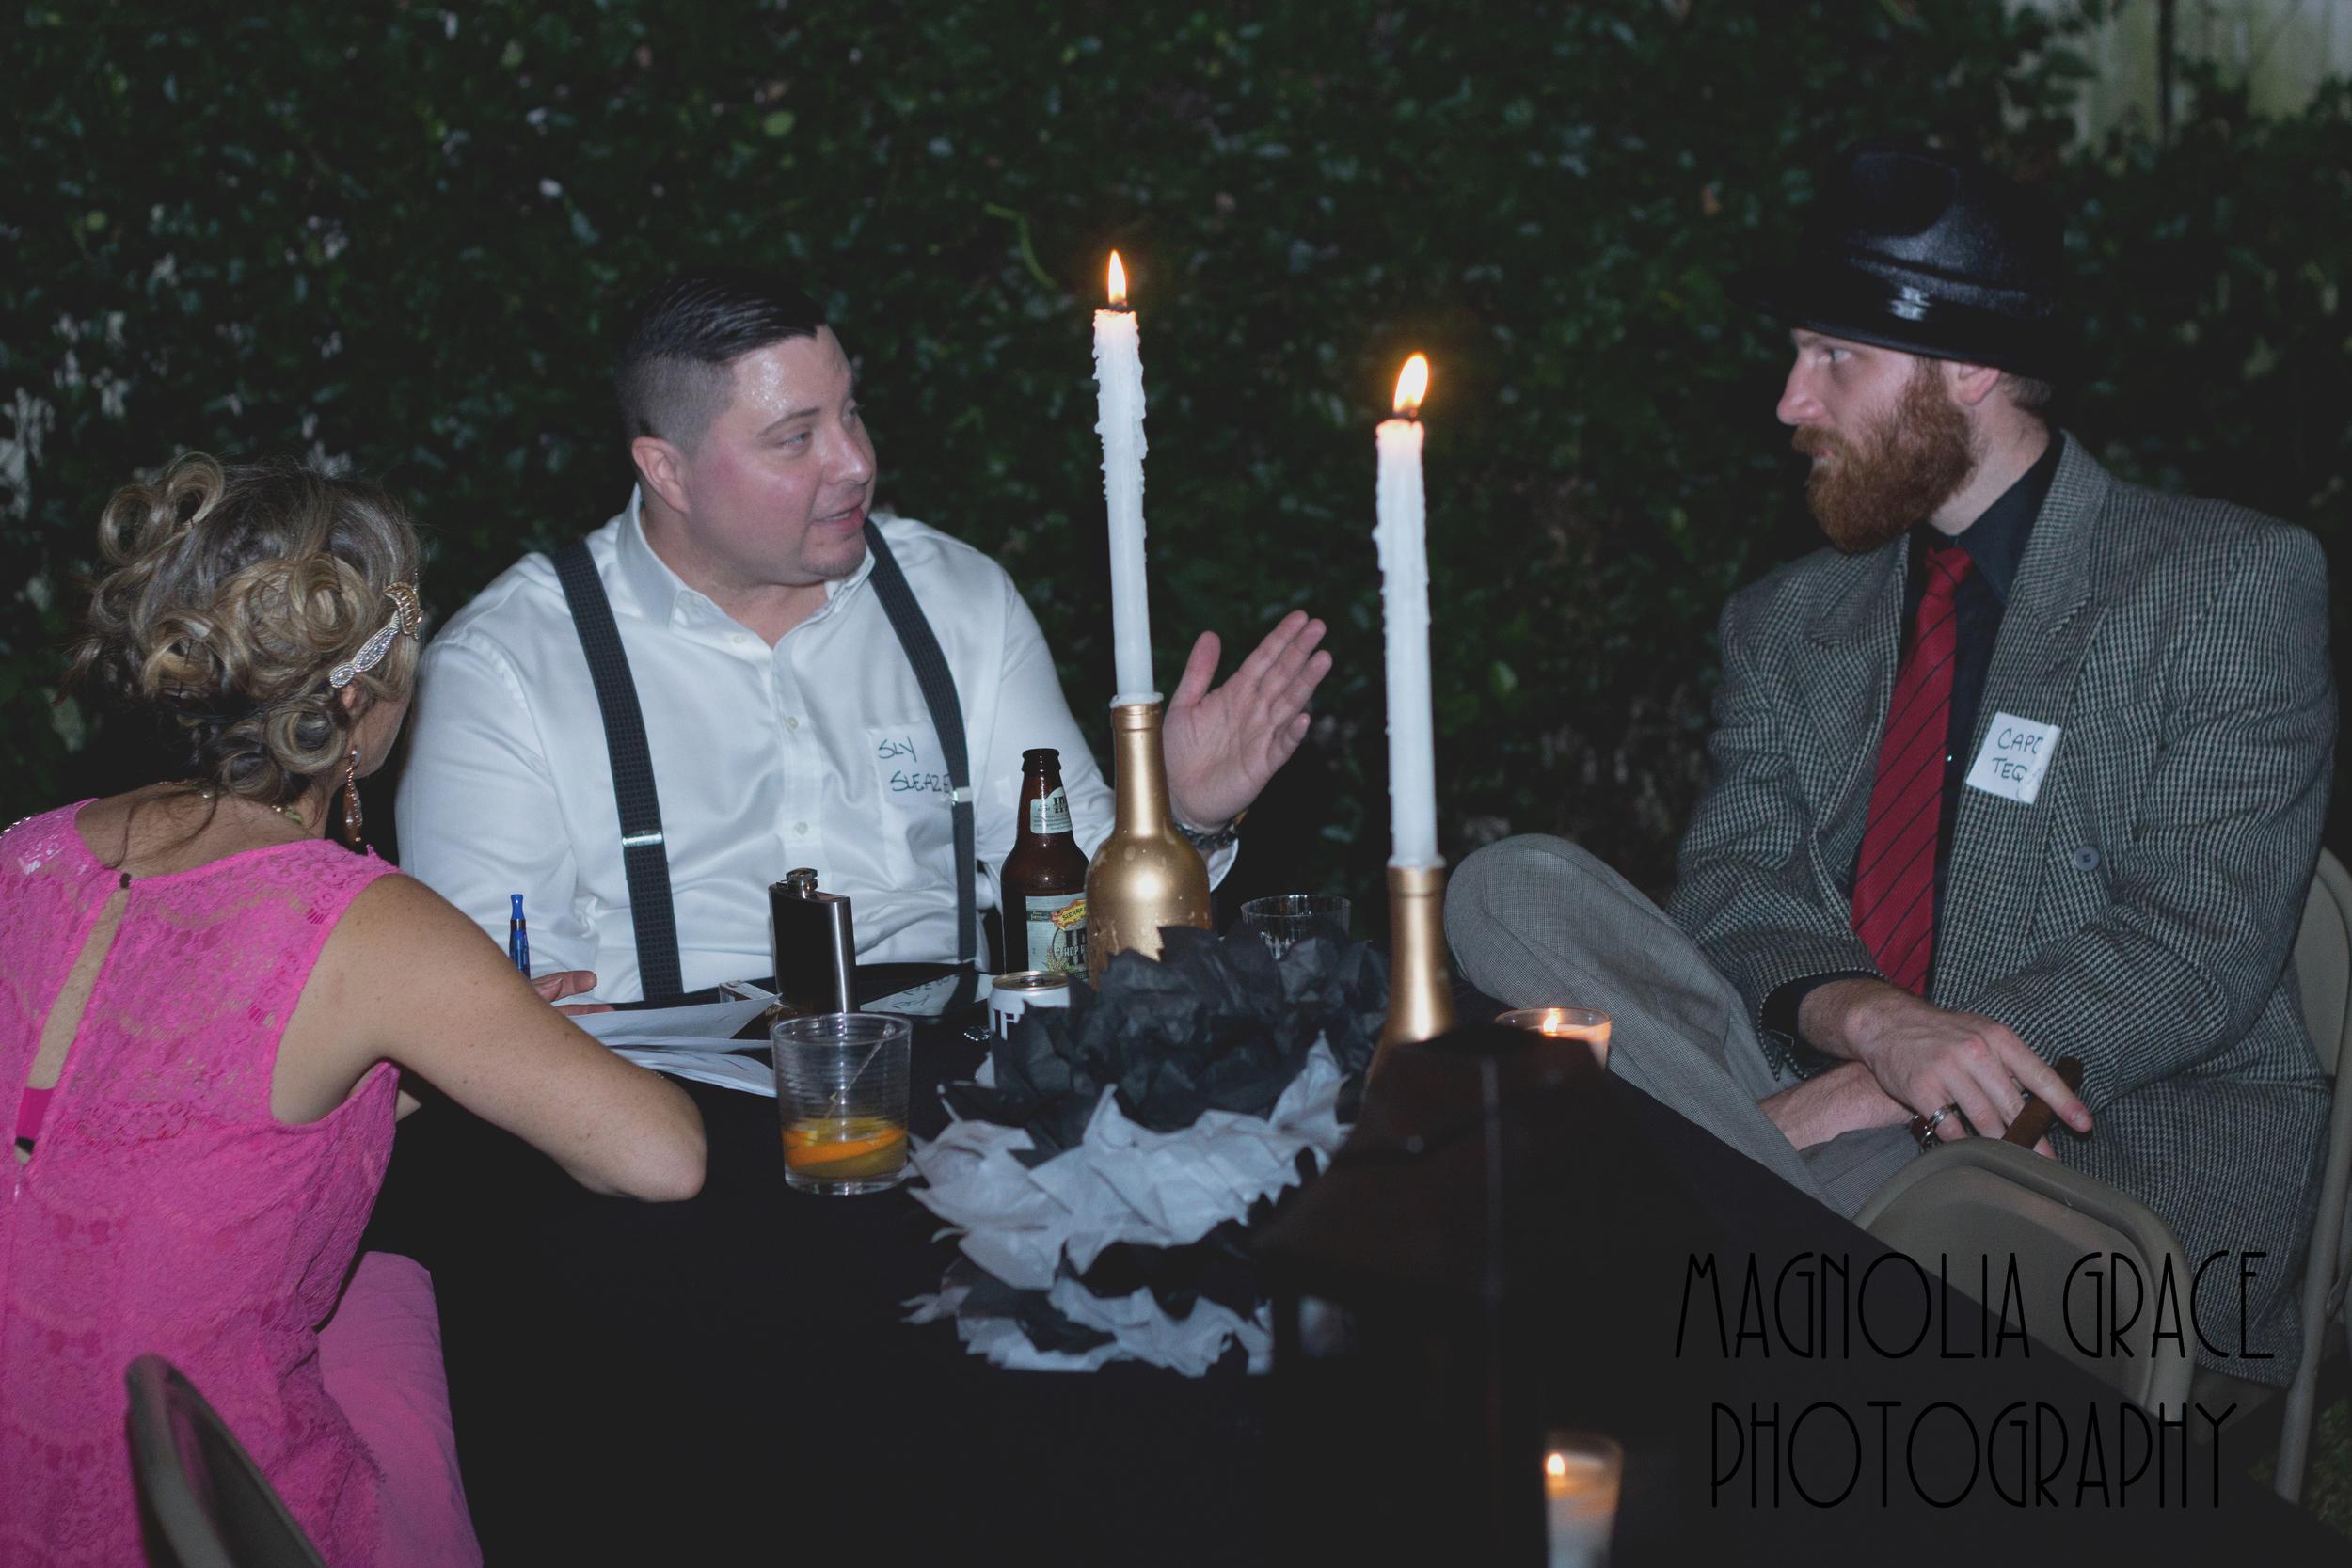 How-To Prohibition Murder-Mystery!   Magnolia Grace Photography   Shreveport La